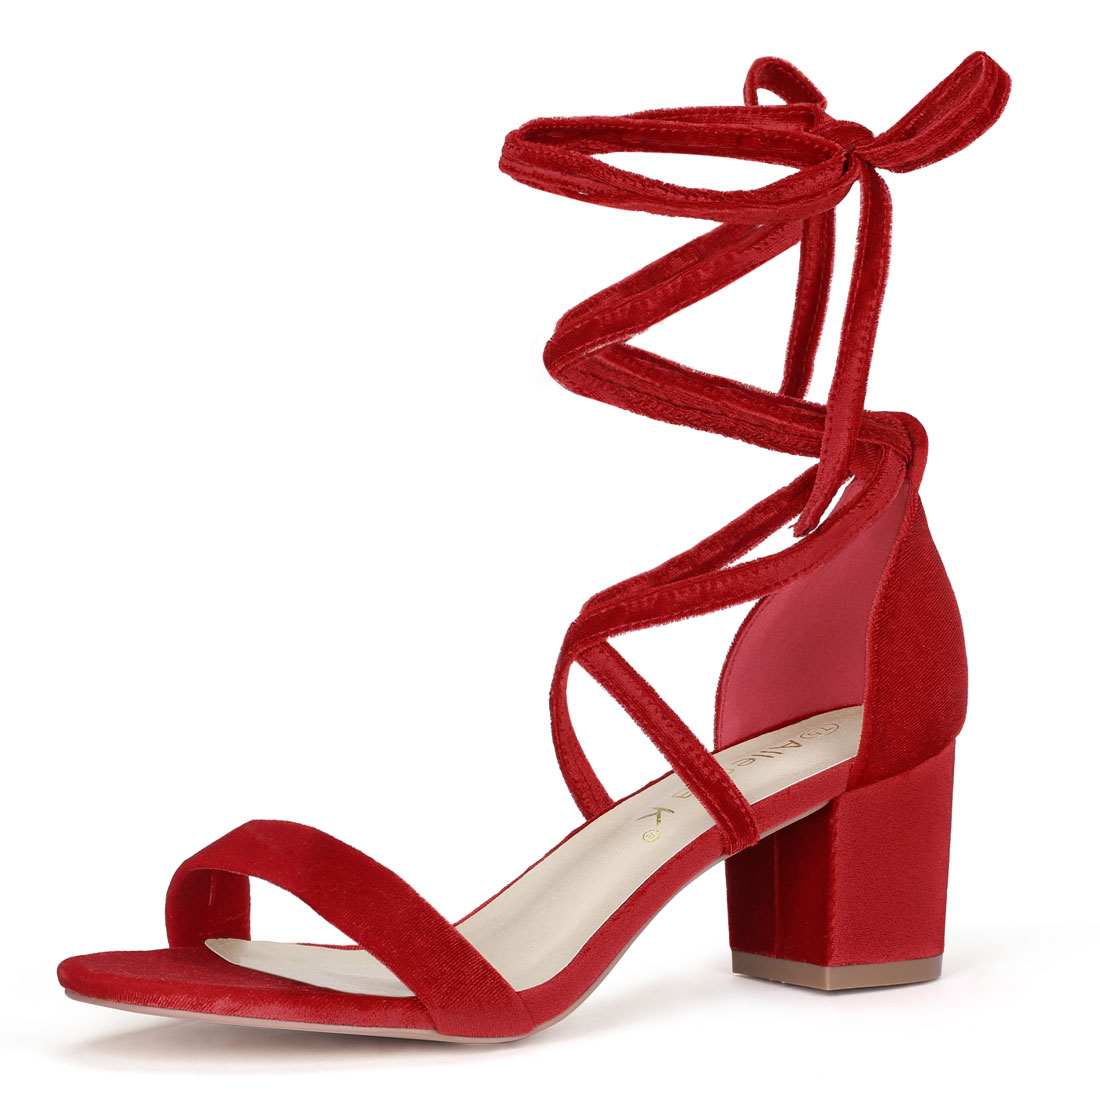 Allegra K Women Open Toe Lace Up Mid Chunky Heeled Sandals Red-velvet 10.5 M US